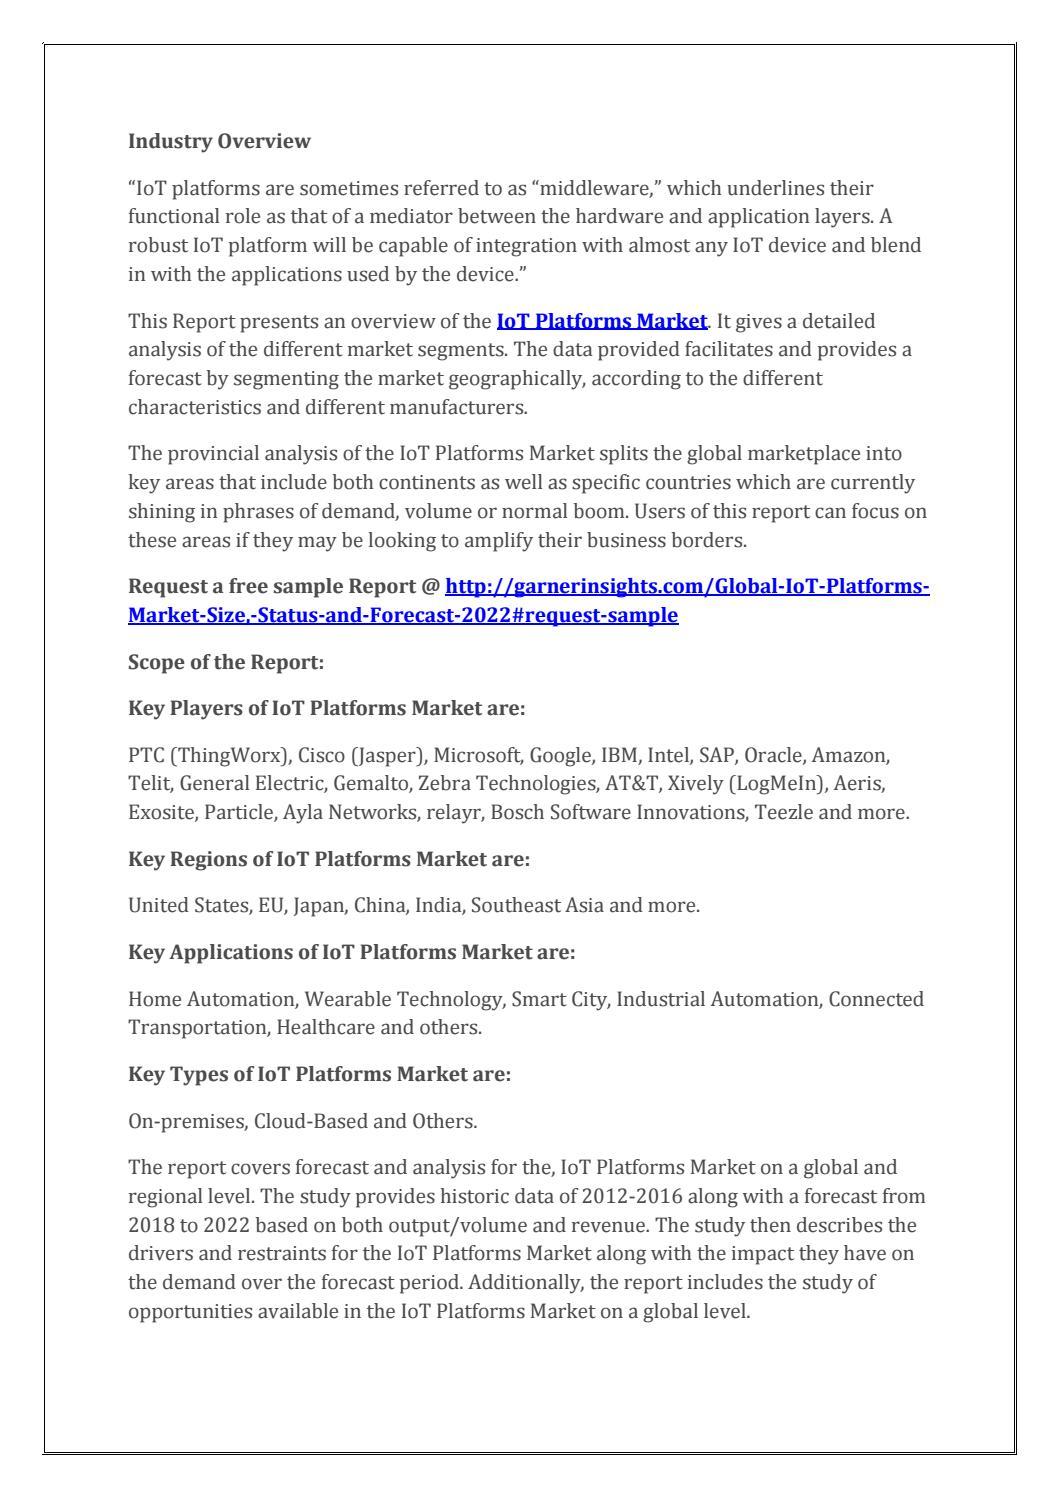 Global iot platforms market intelligence report 2018 by Gordon